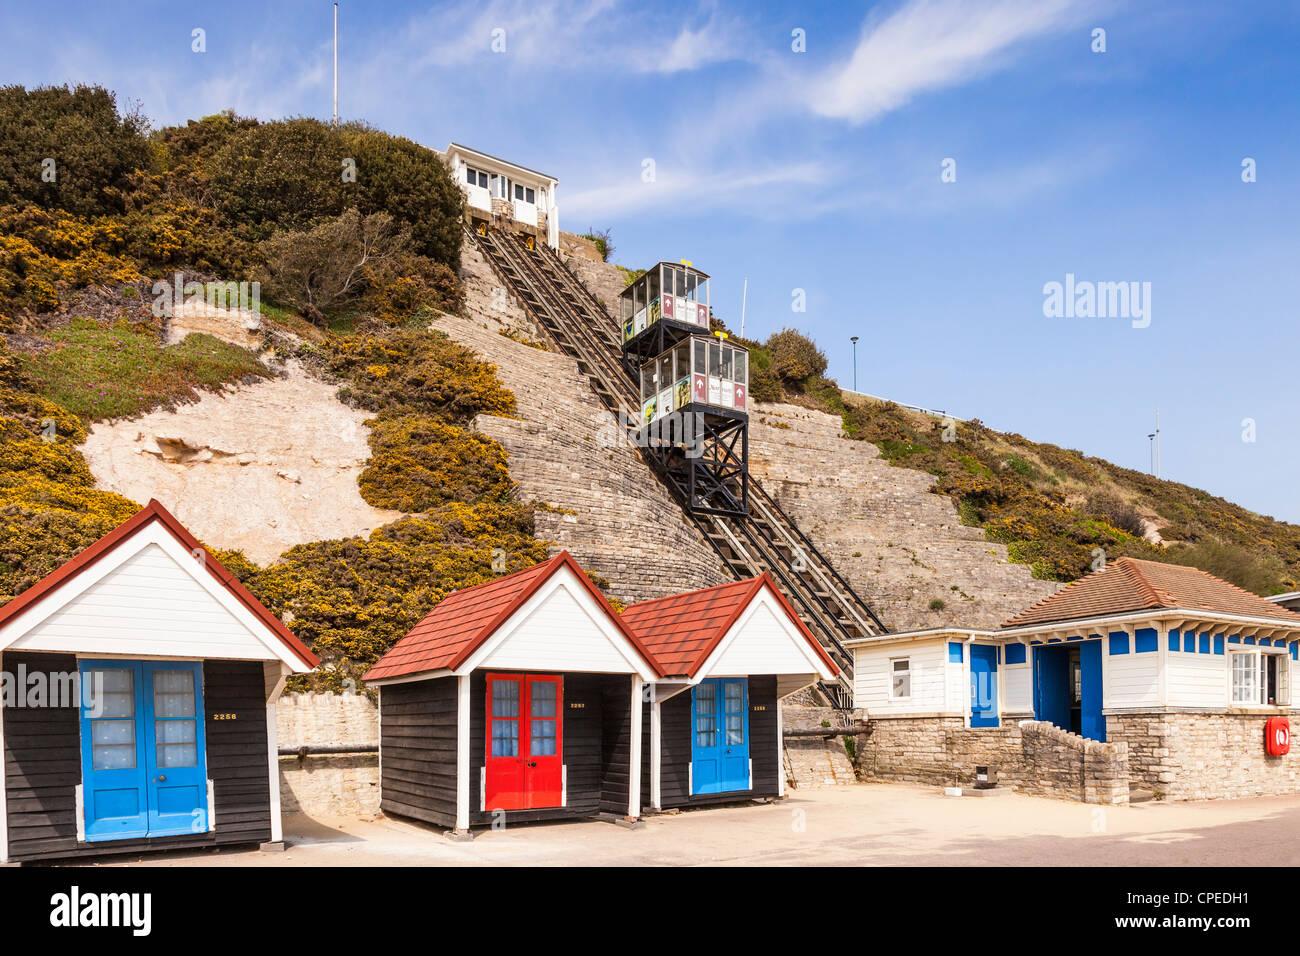 West Cliff Lift Bournemouth Dorset - Stock Image